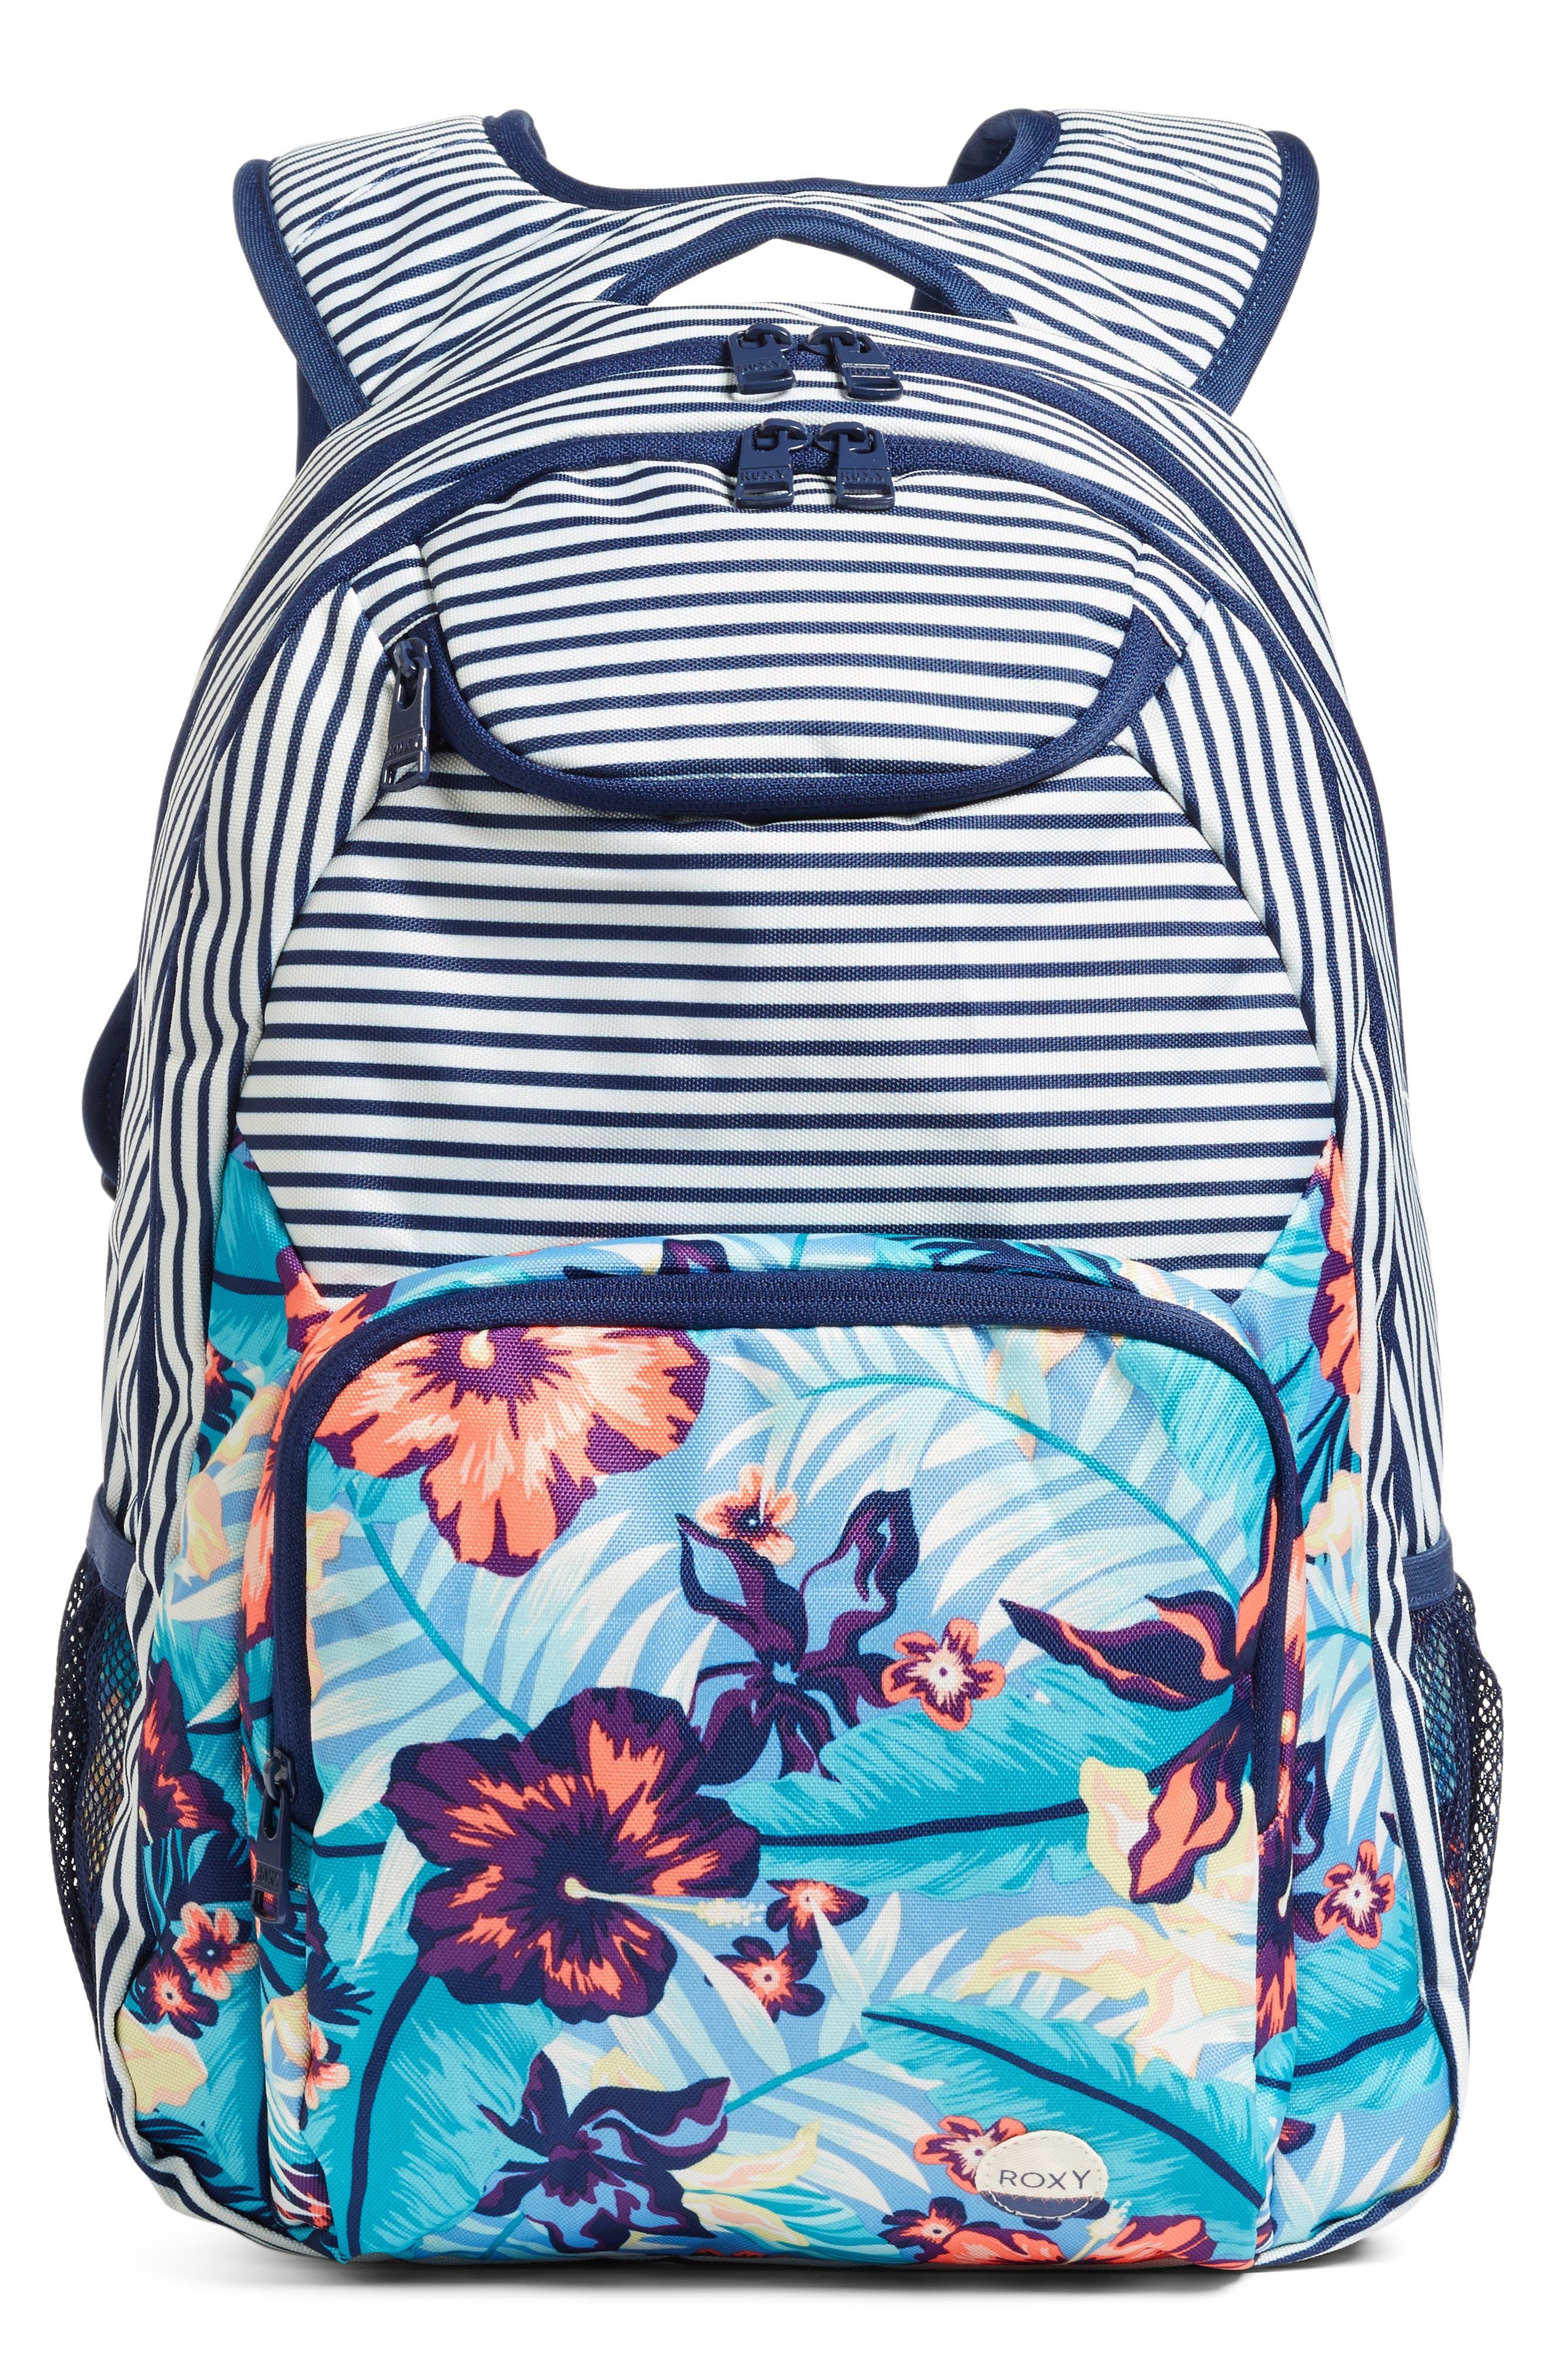 Main Image - Roxy Shadow Swell Backpack